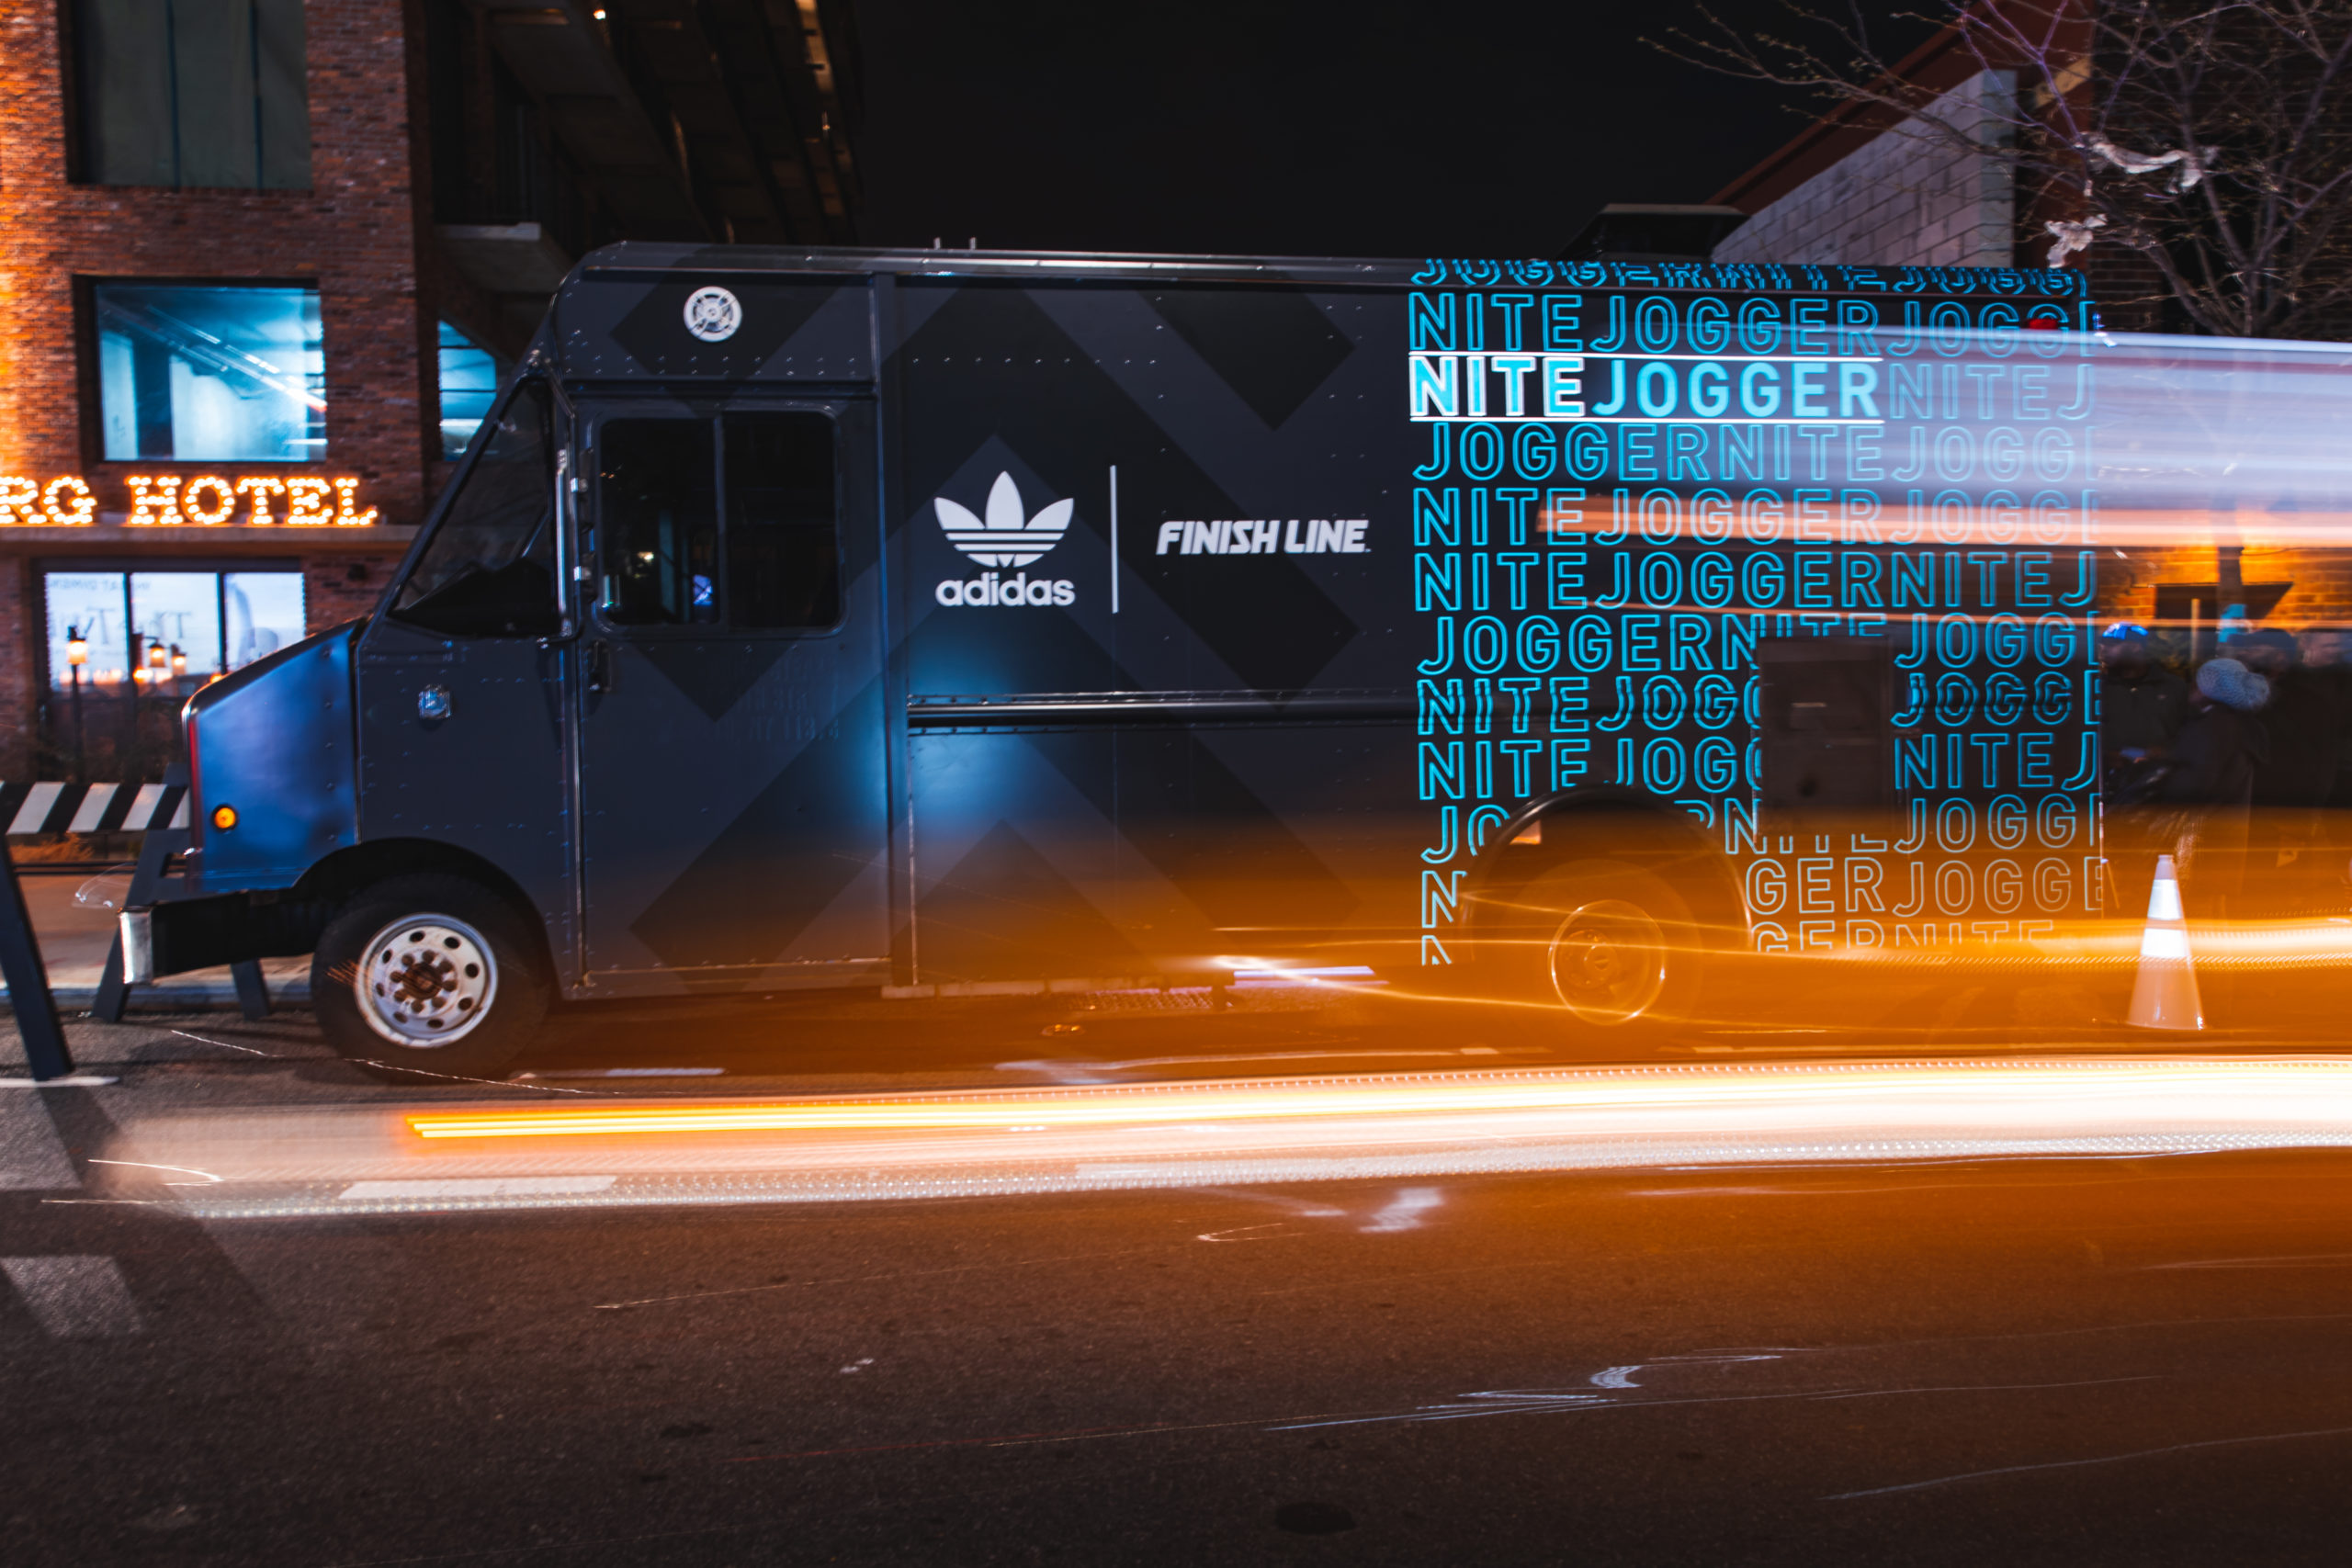 Adidas Nite Jogger Branded Food Truck